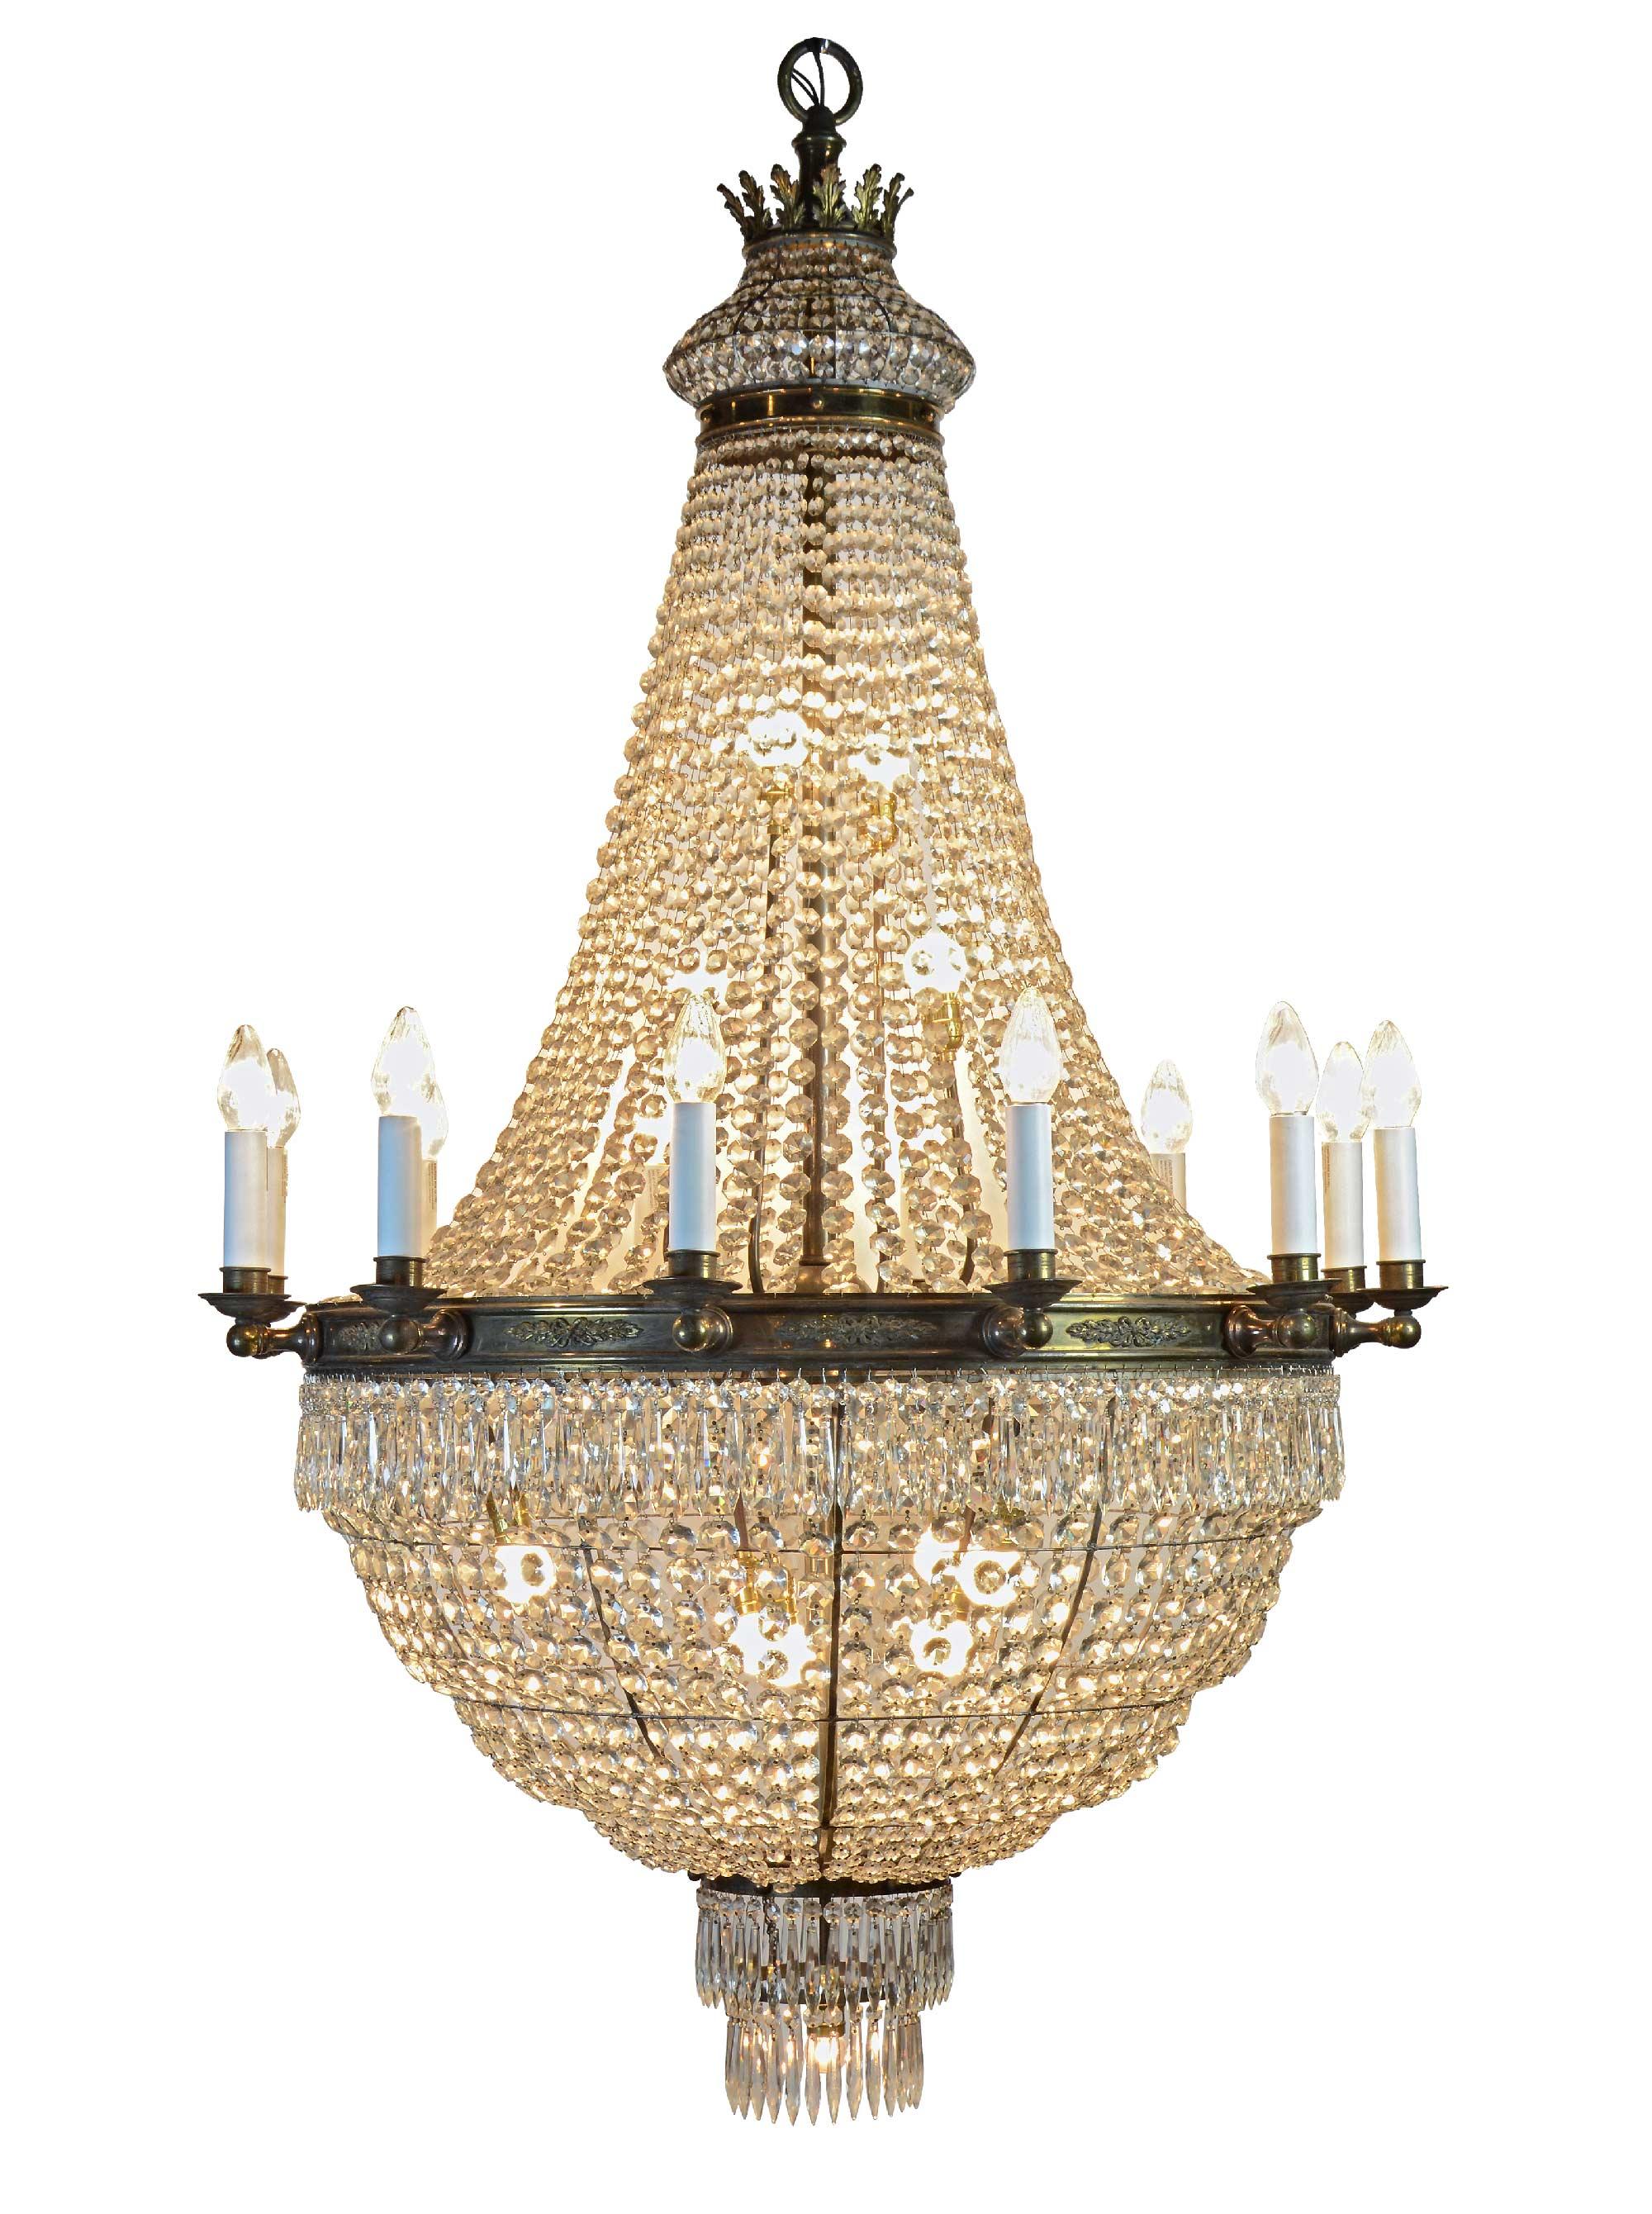 46798-crystal-chandelier-lit.jpg